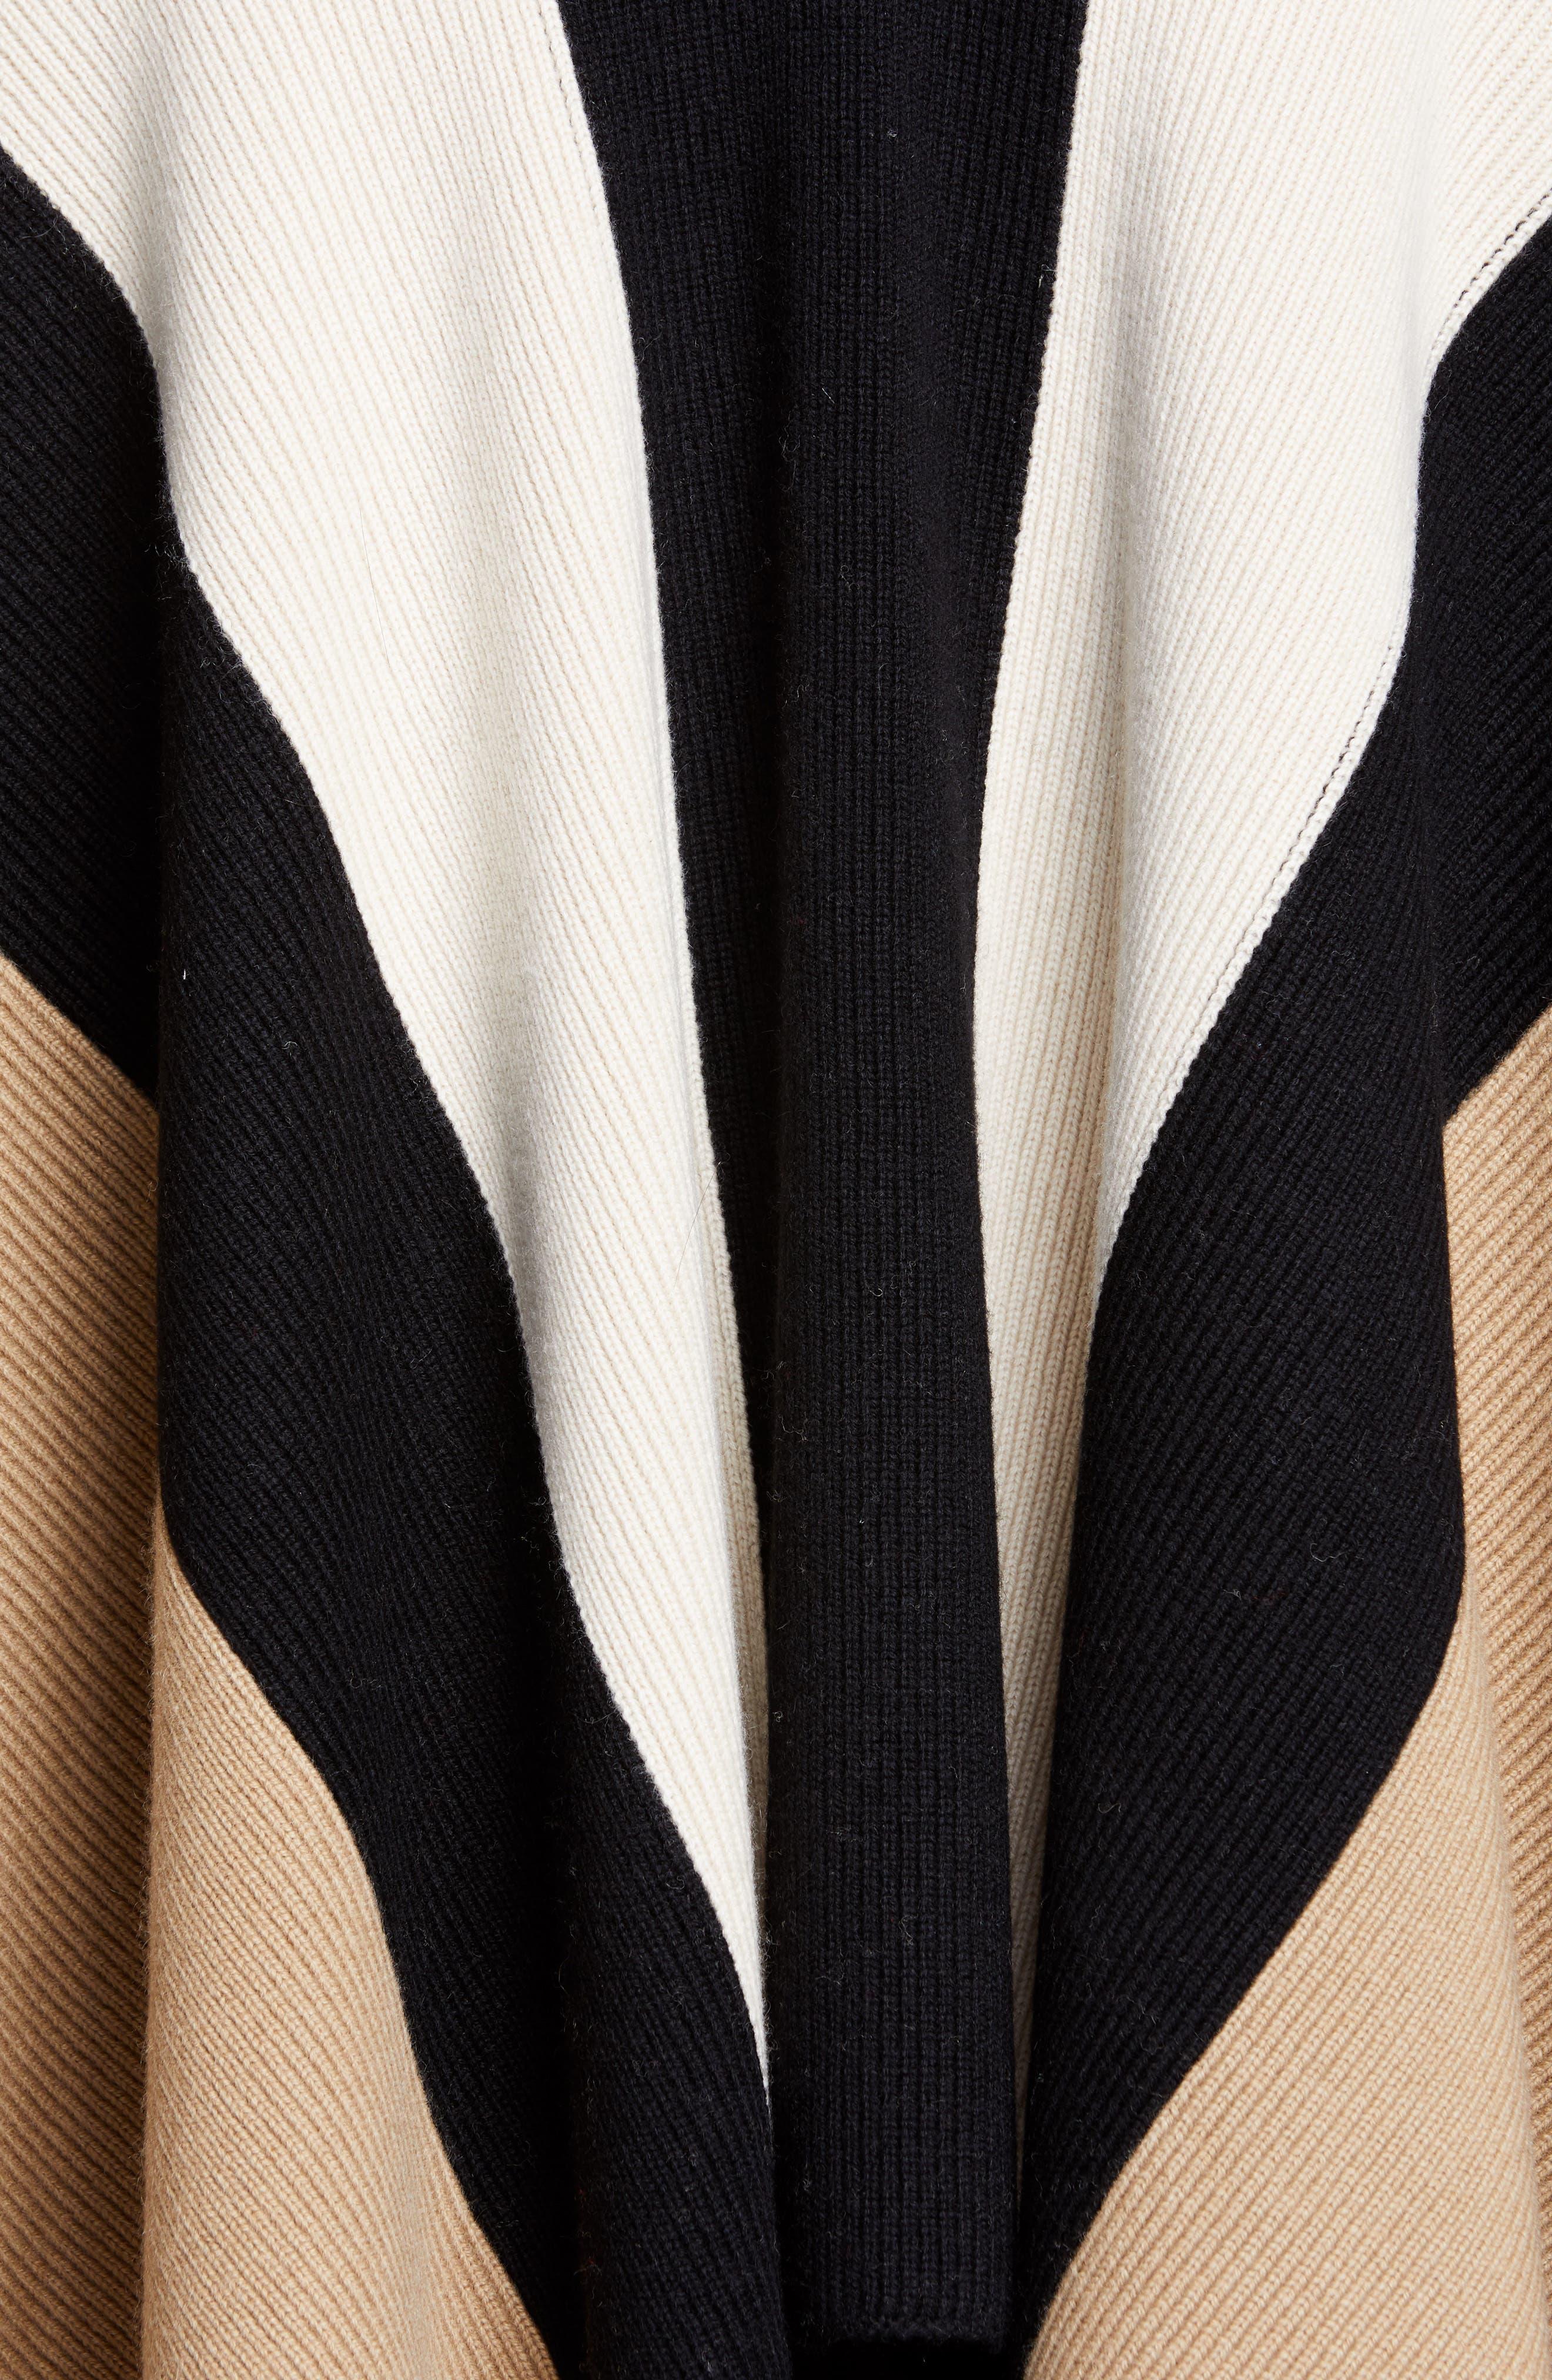 BURBERRY, Stripe Wool & Cashmere Cape, Alternate thumbnail 5, color, CAMEL